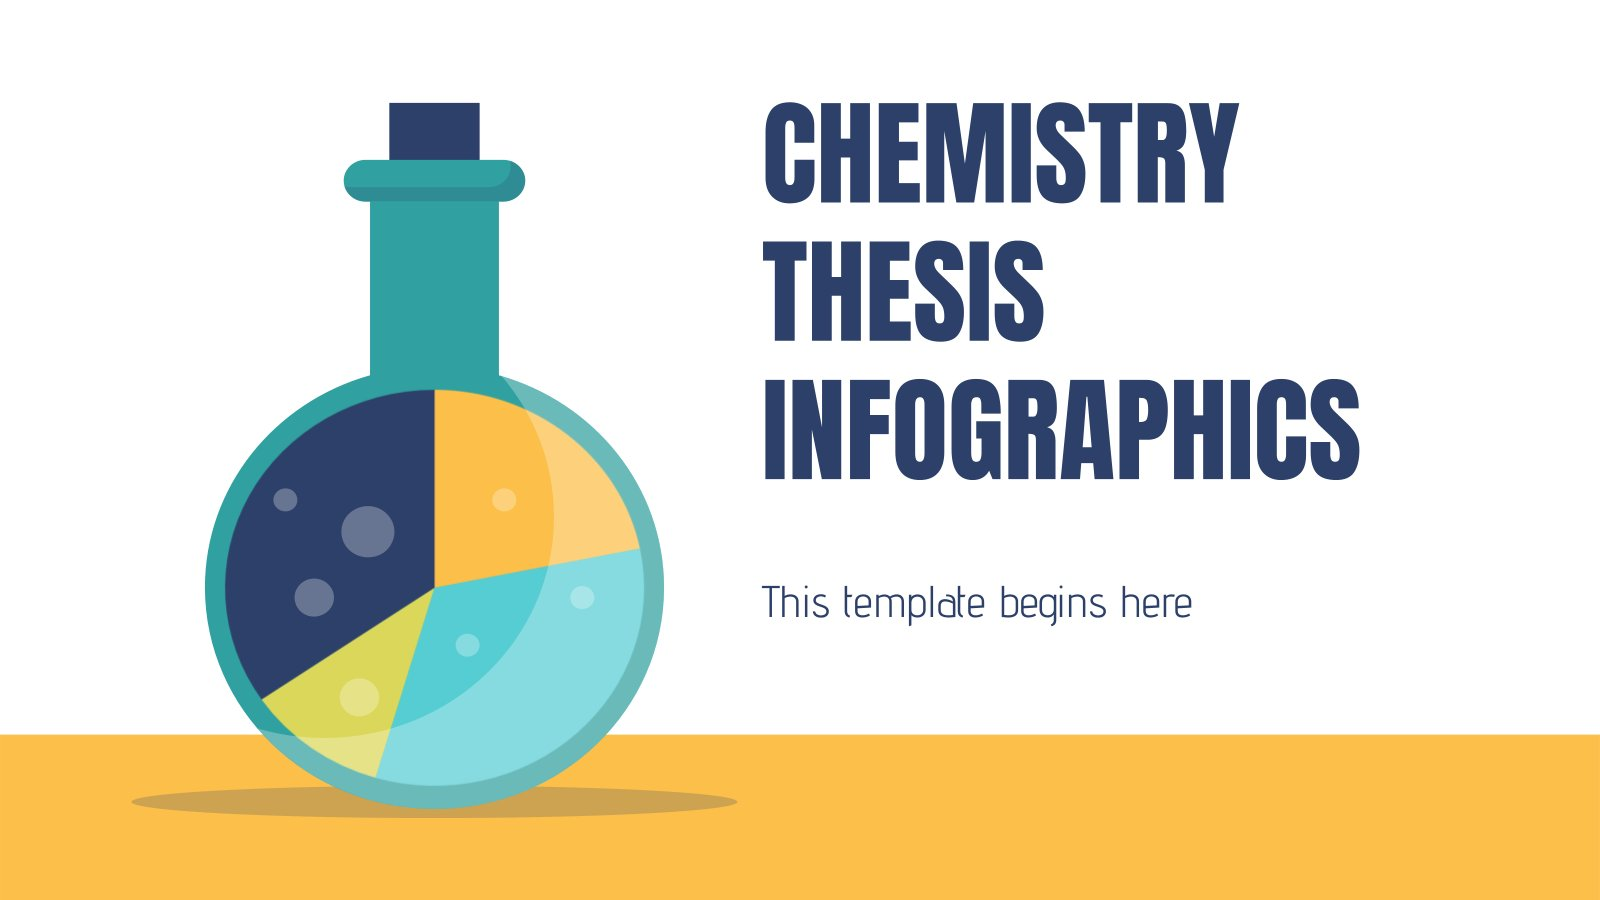 Plantilla de presentación Infografías tesis de química